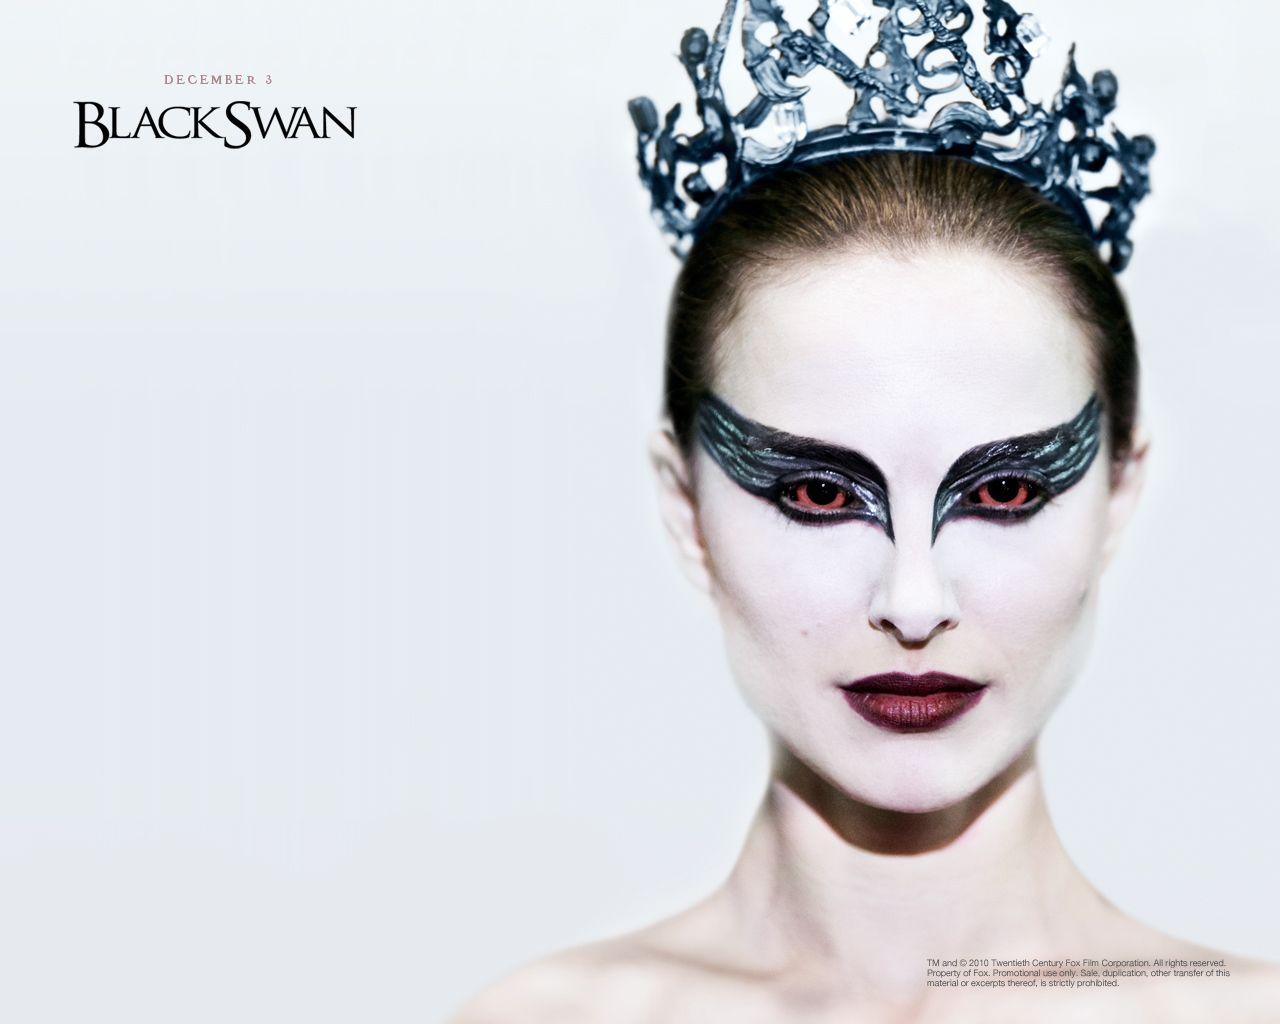 http://1.bp.blogspot.com/_G8I3DxqMsW8/TSZXBQHDLKI/AAAAAAAAAp4/_7RXY6uGCHQ/s1600/2010_black_swan_wallpaper_001.jpg